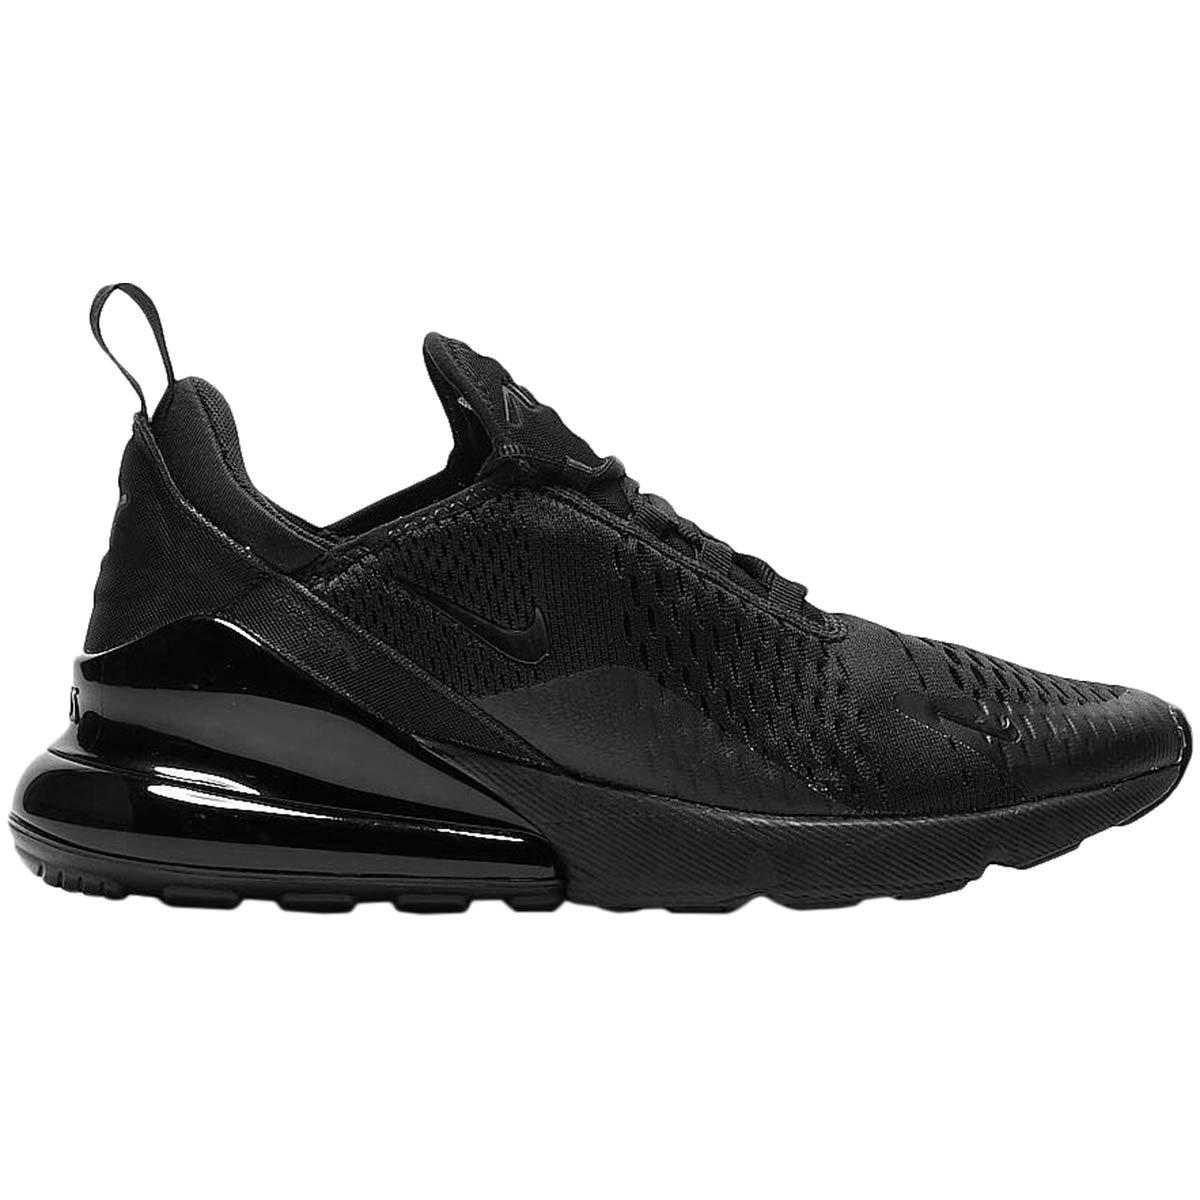 1a19d17ed6 Galleon - Nike Air Max 270 Men's Running Shoes Black/Black-Black AH8050-005  (9.5 D(M) US)